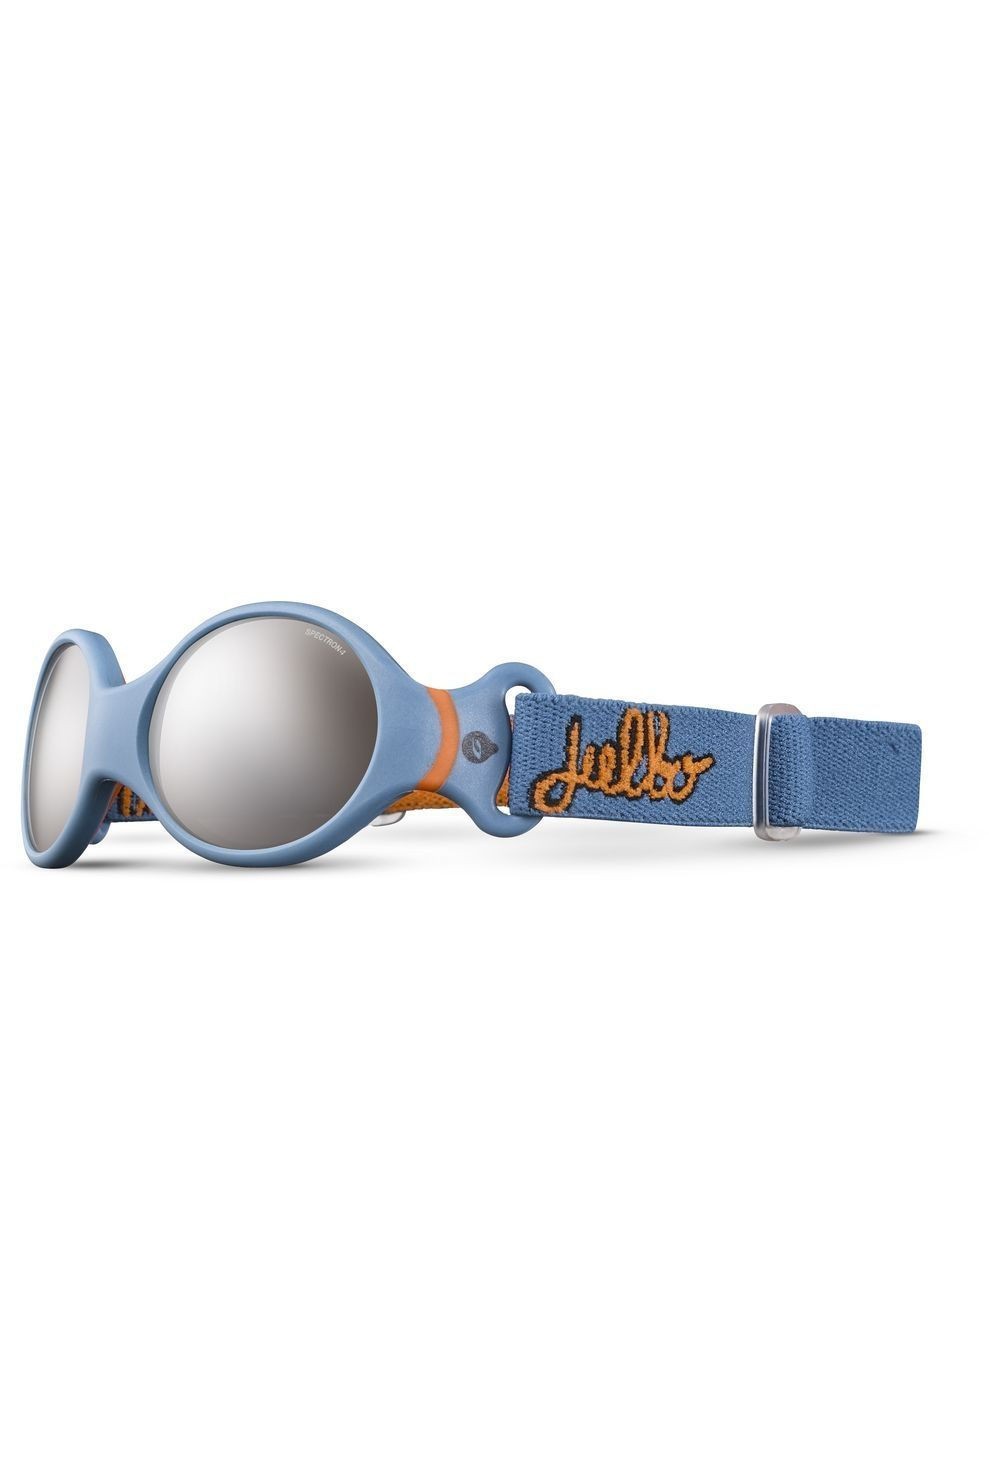 Julbo Bril Loop S - Blauw/Oranje